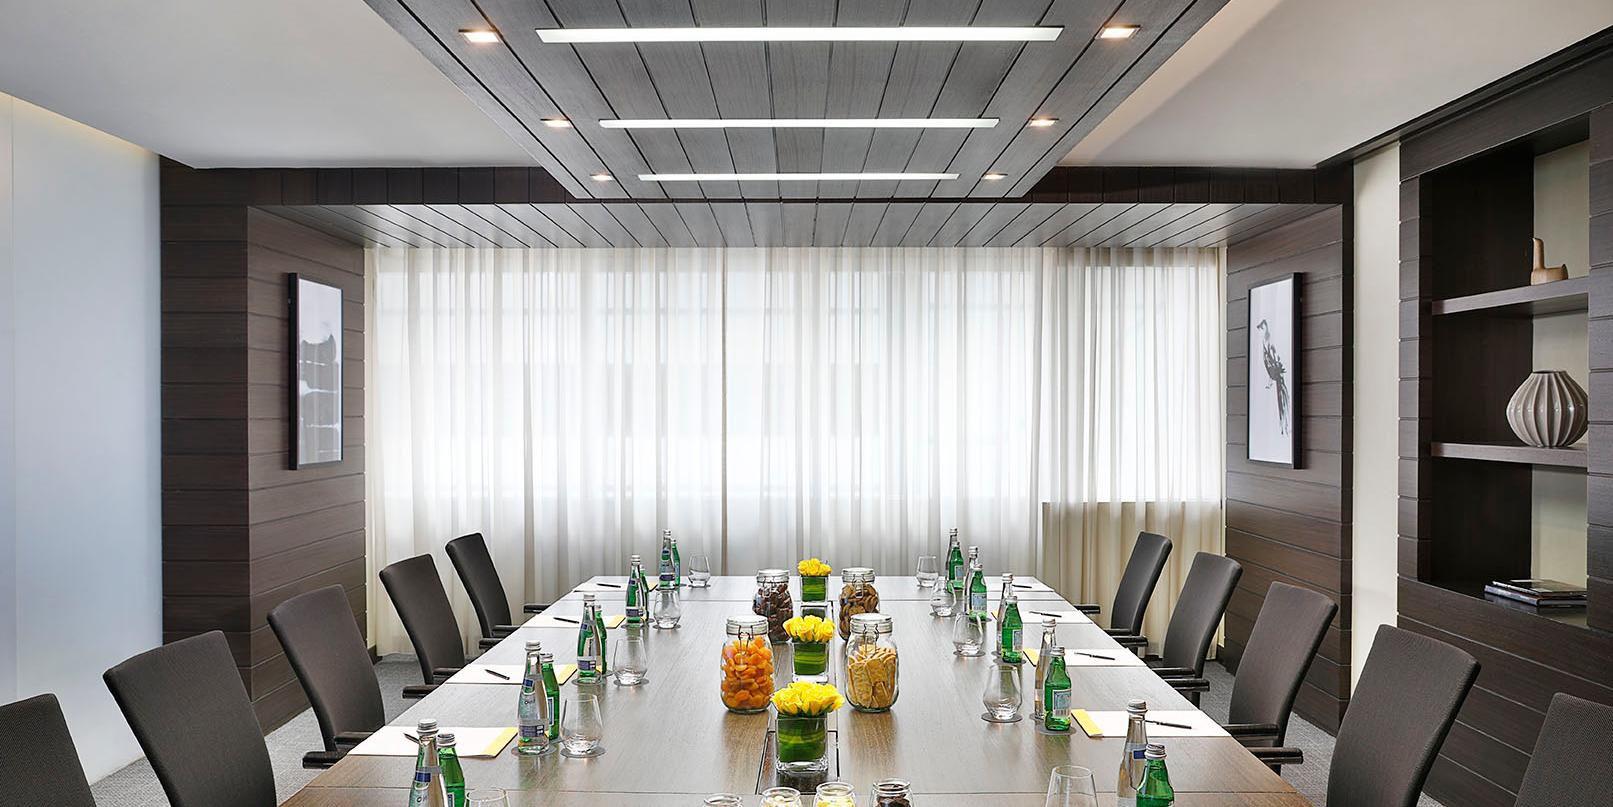 Daylight Meeting Plus, High Floor, voco Dubai, Sheikh Zayed Road